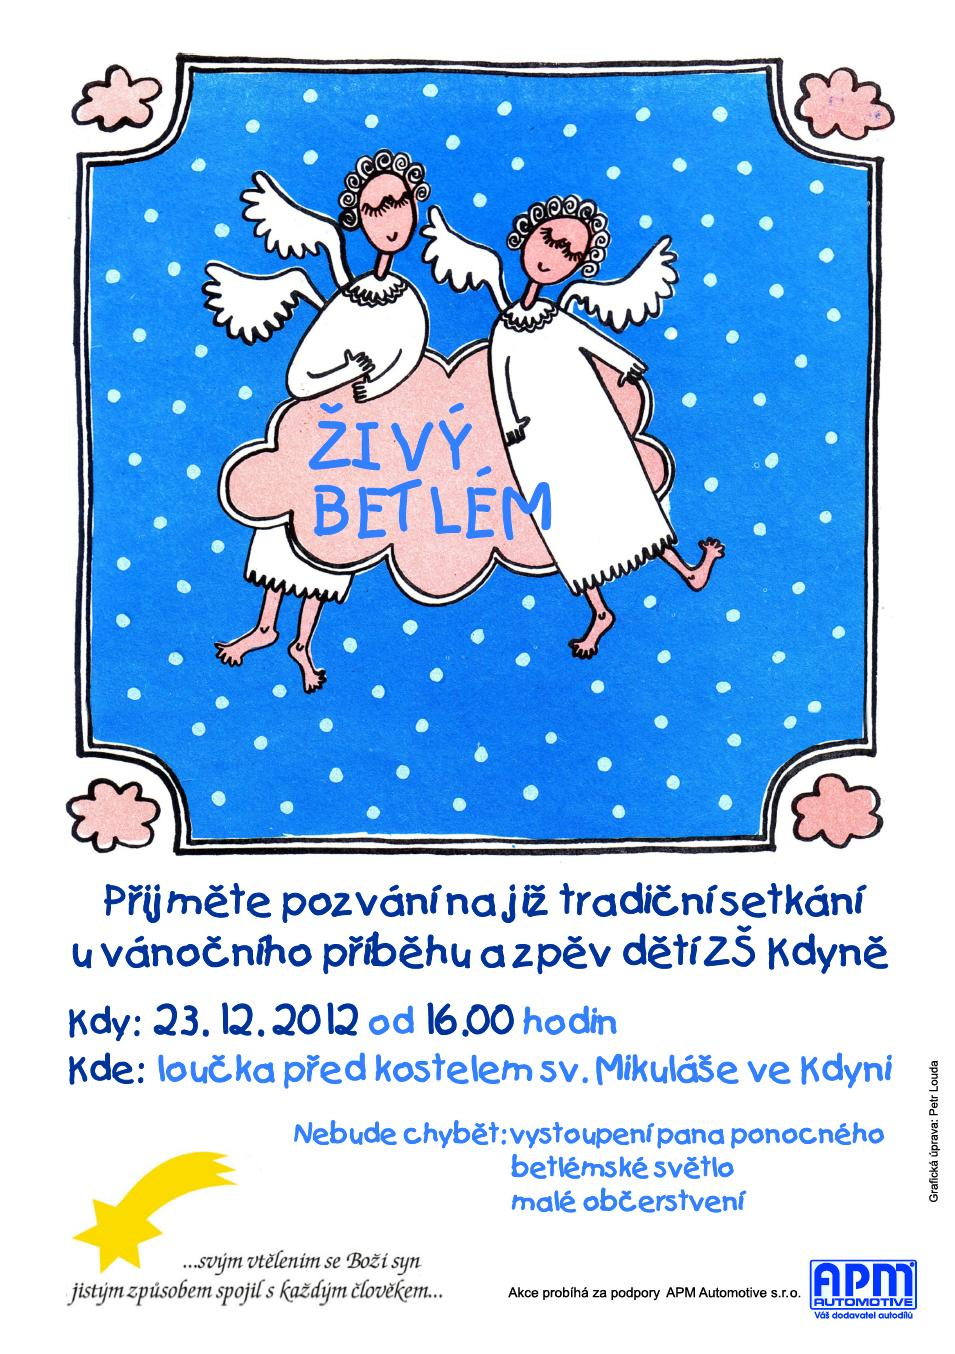 zivy_betlem_2012